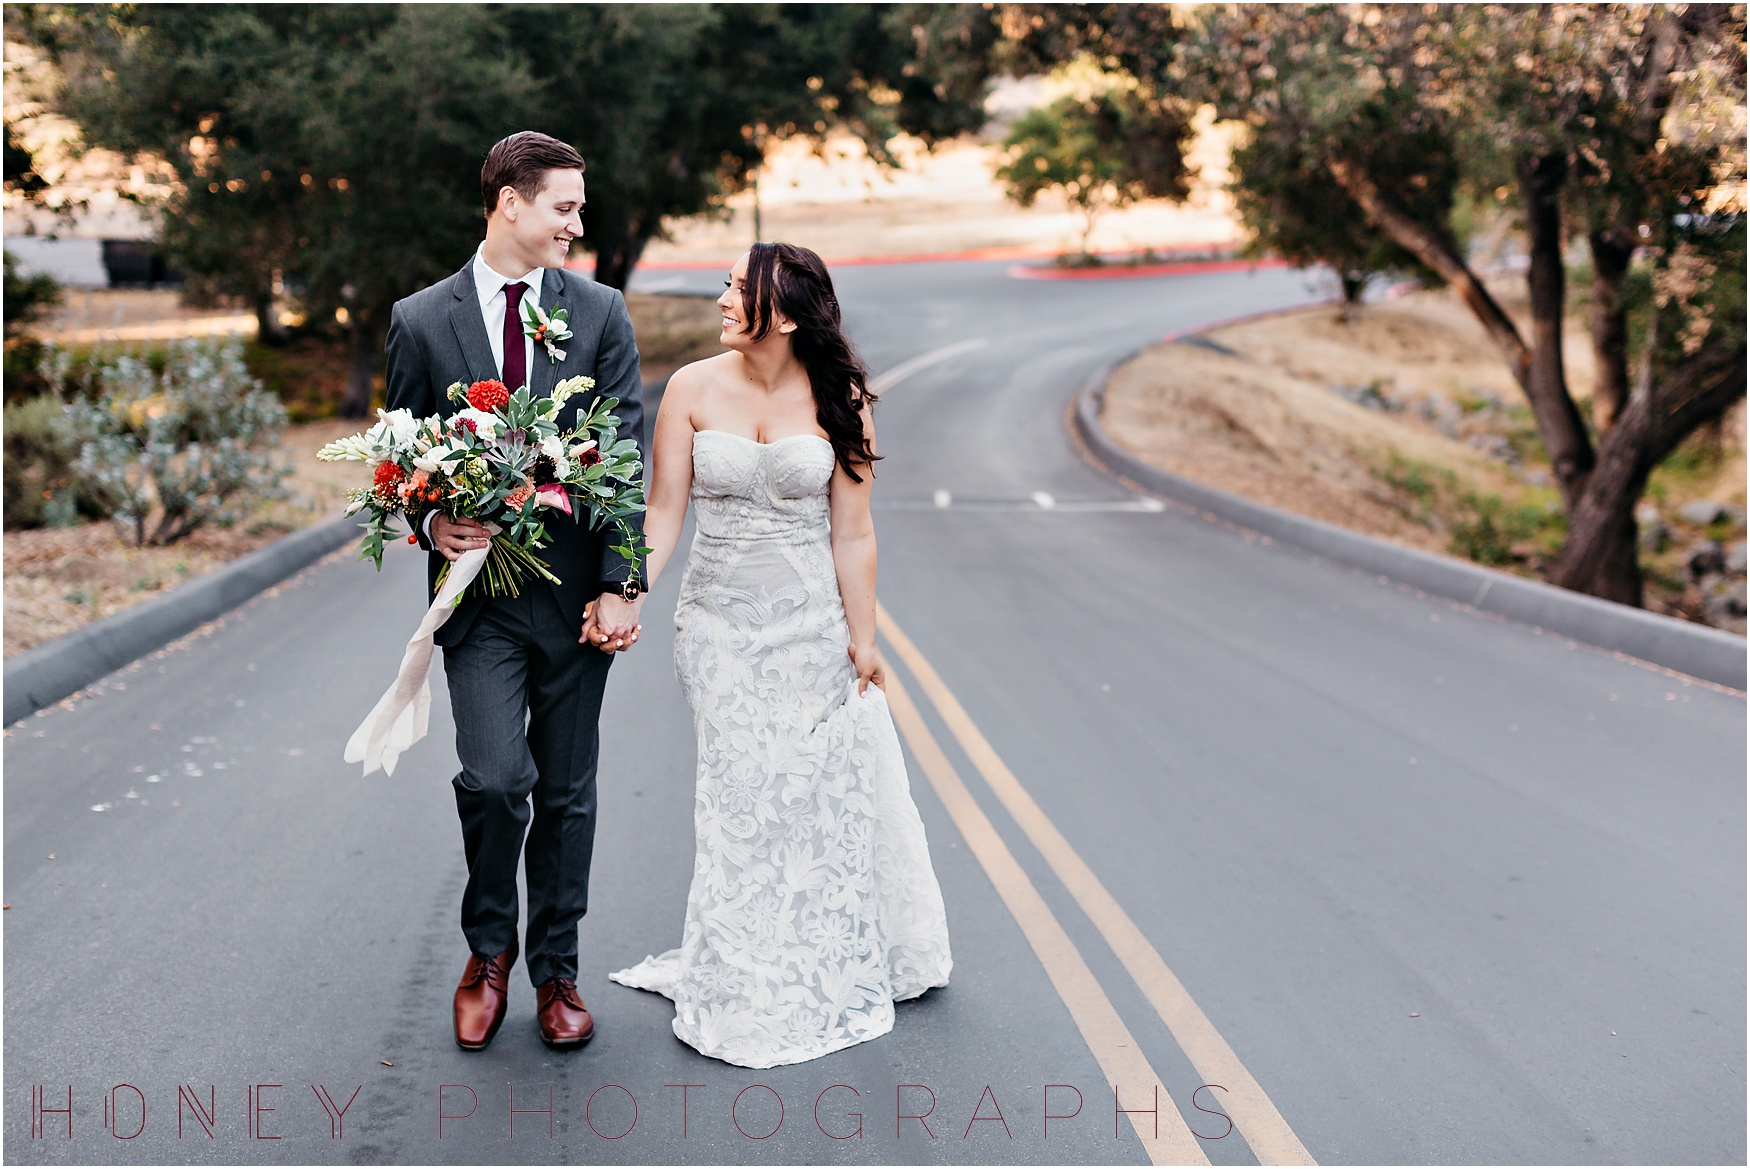 picnic-wedding-rustic-sweetheart-table-felicita-park-boho19.jpg